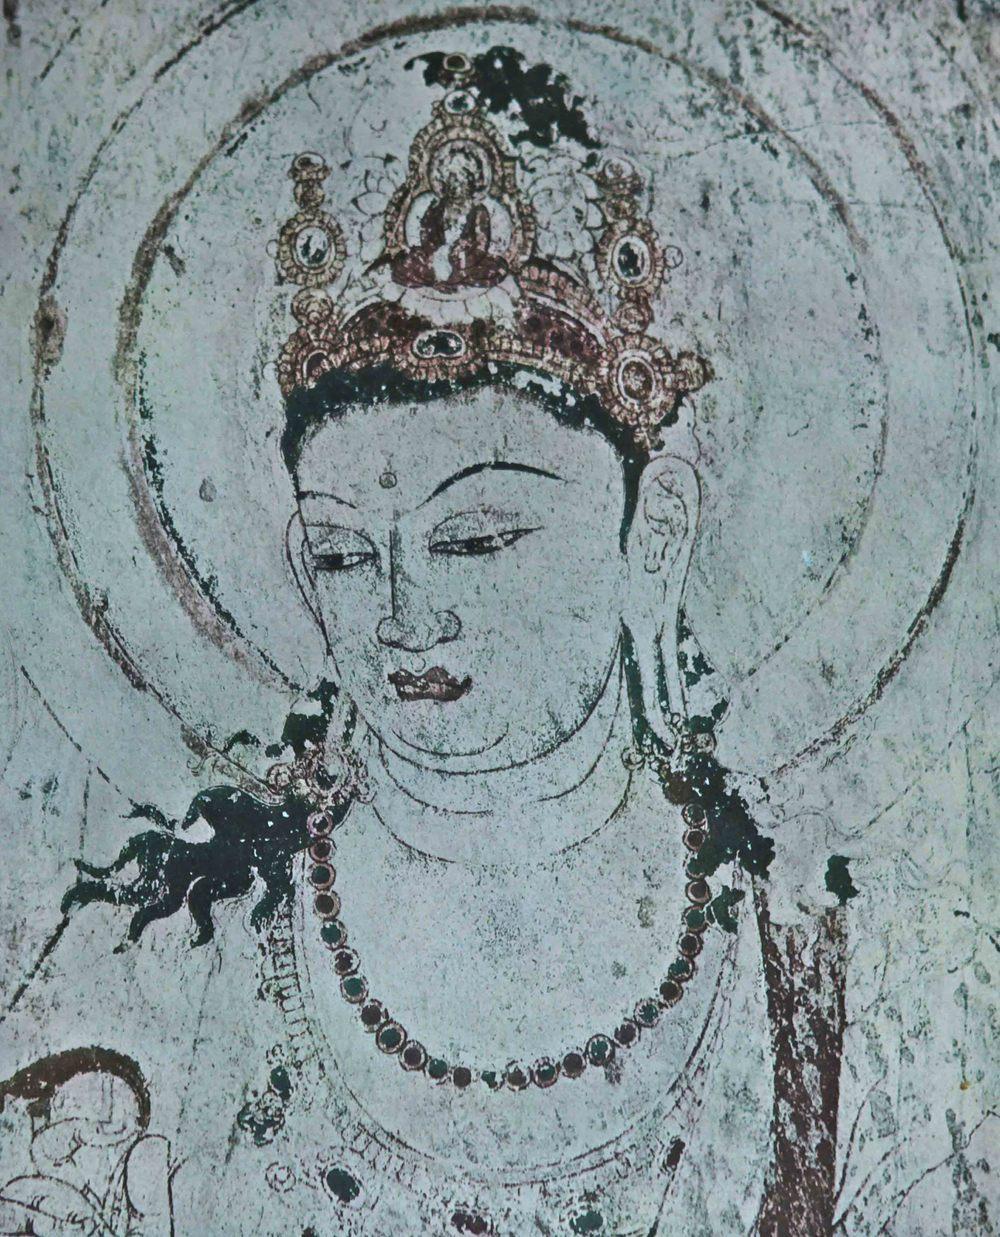 Avalokiteshvara Bodhisattva - freies Sehen mit Mitgefühl